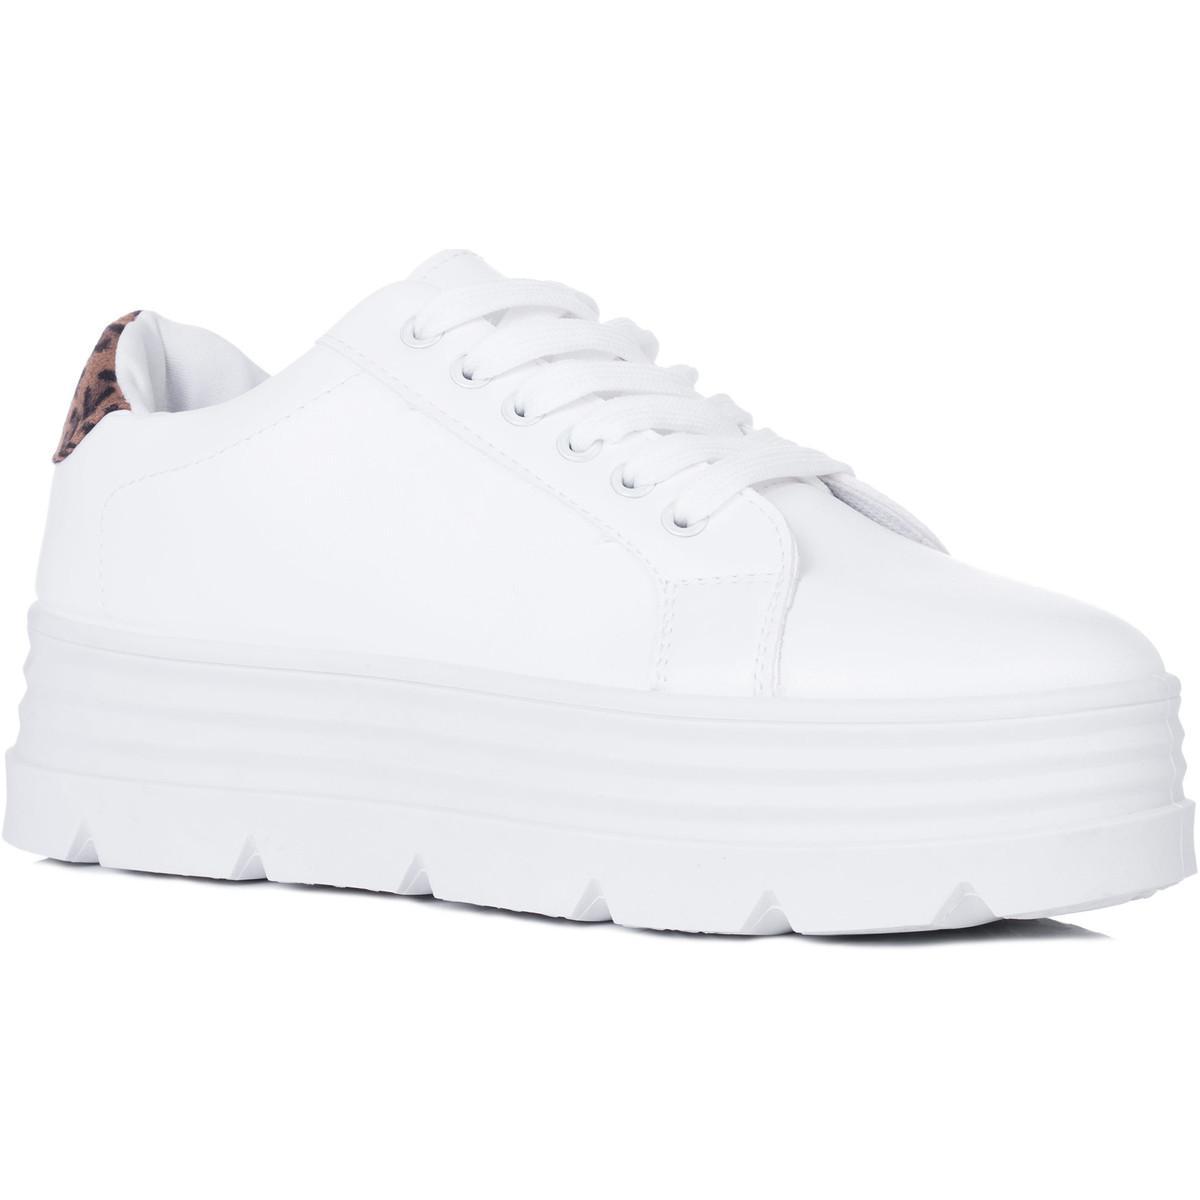 a41966bd8 SPYLOVEBUY Loowey Women's Shoes (trainers) In Brown in Brown - Lyst